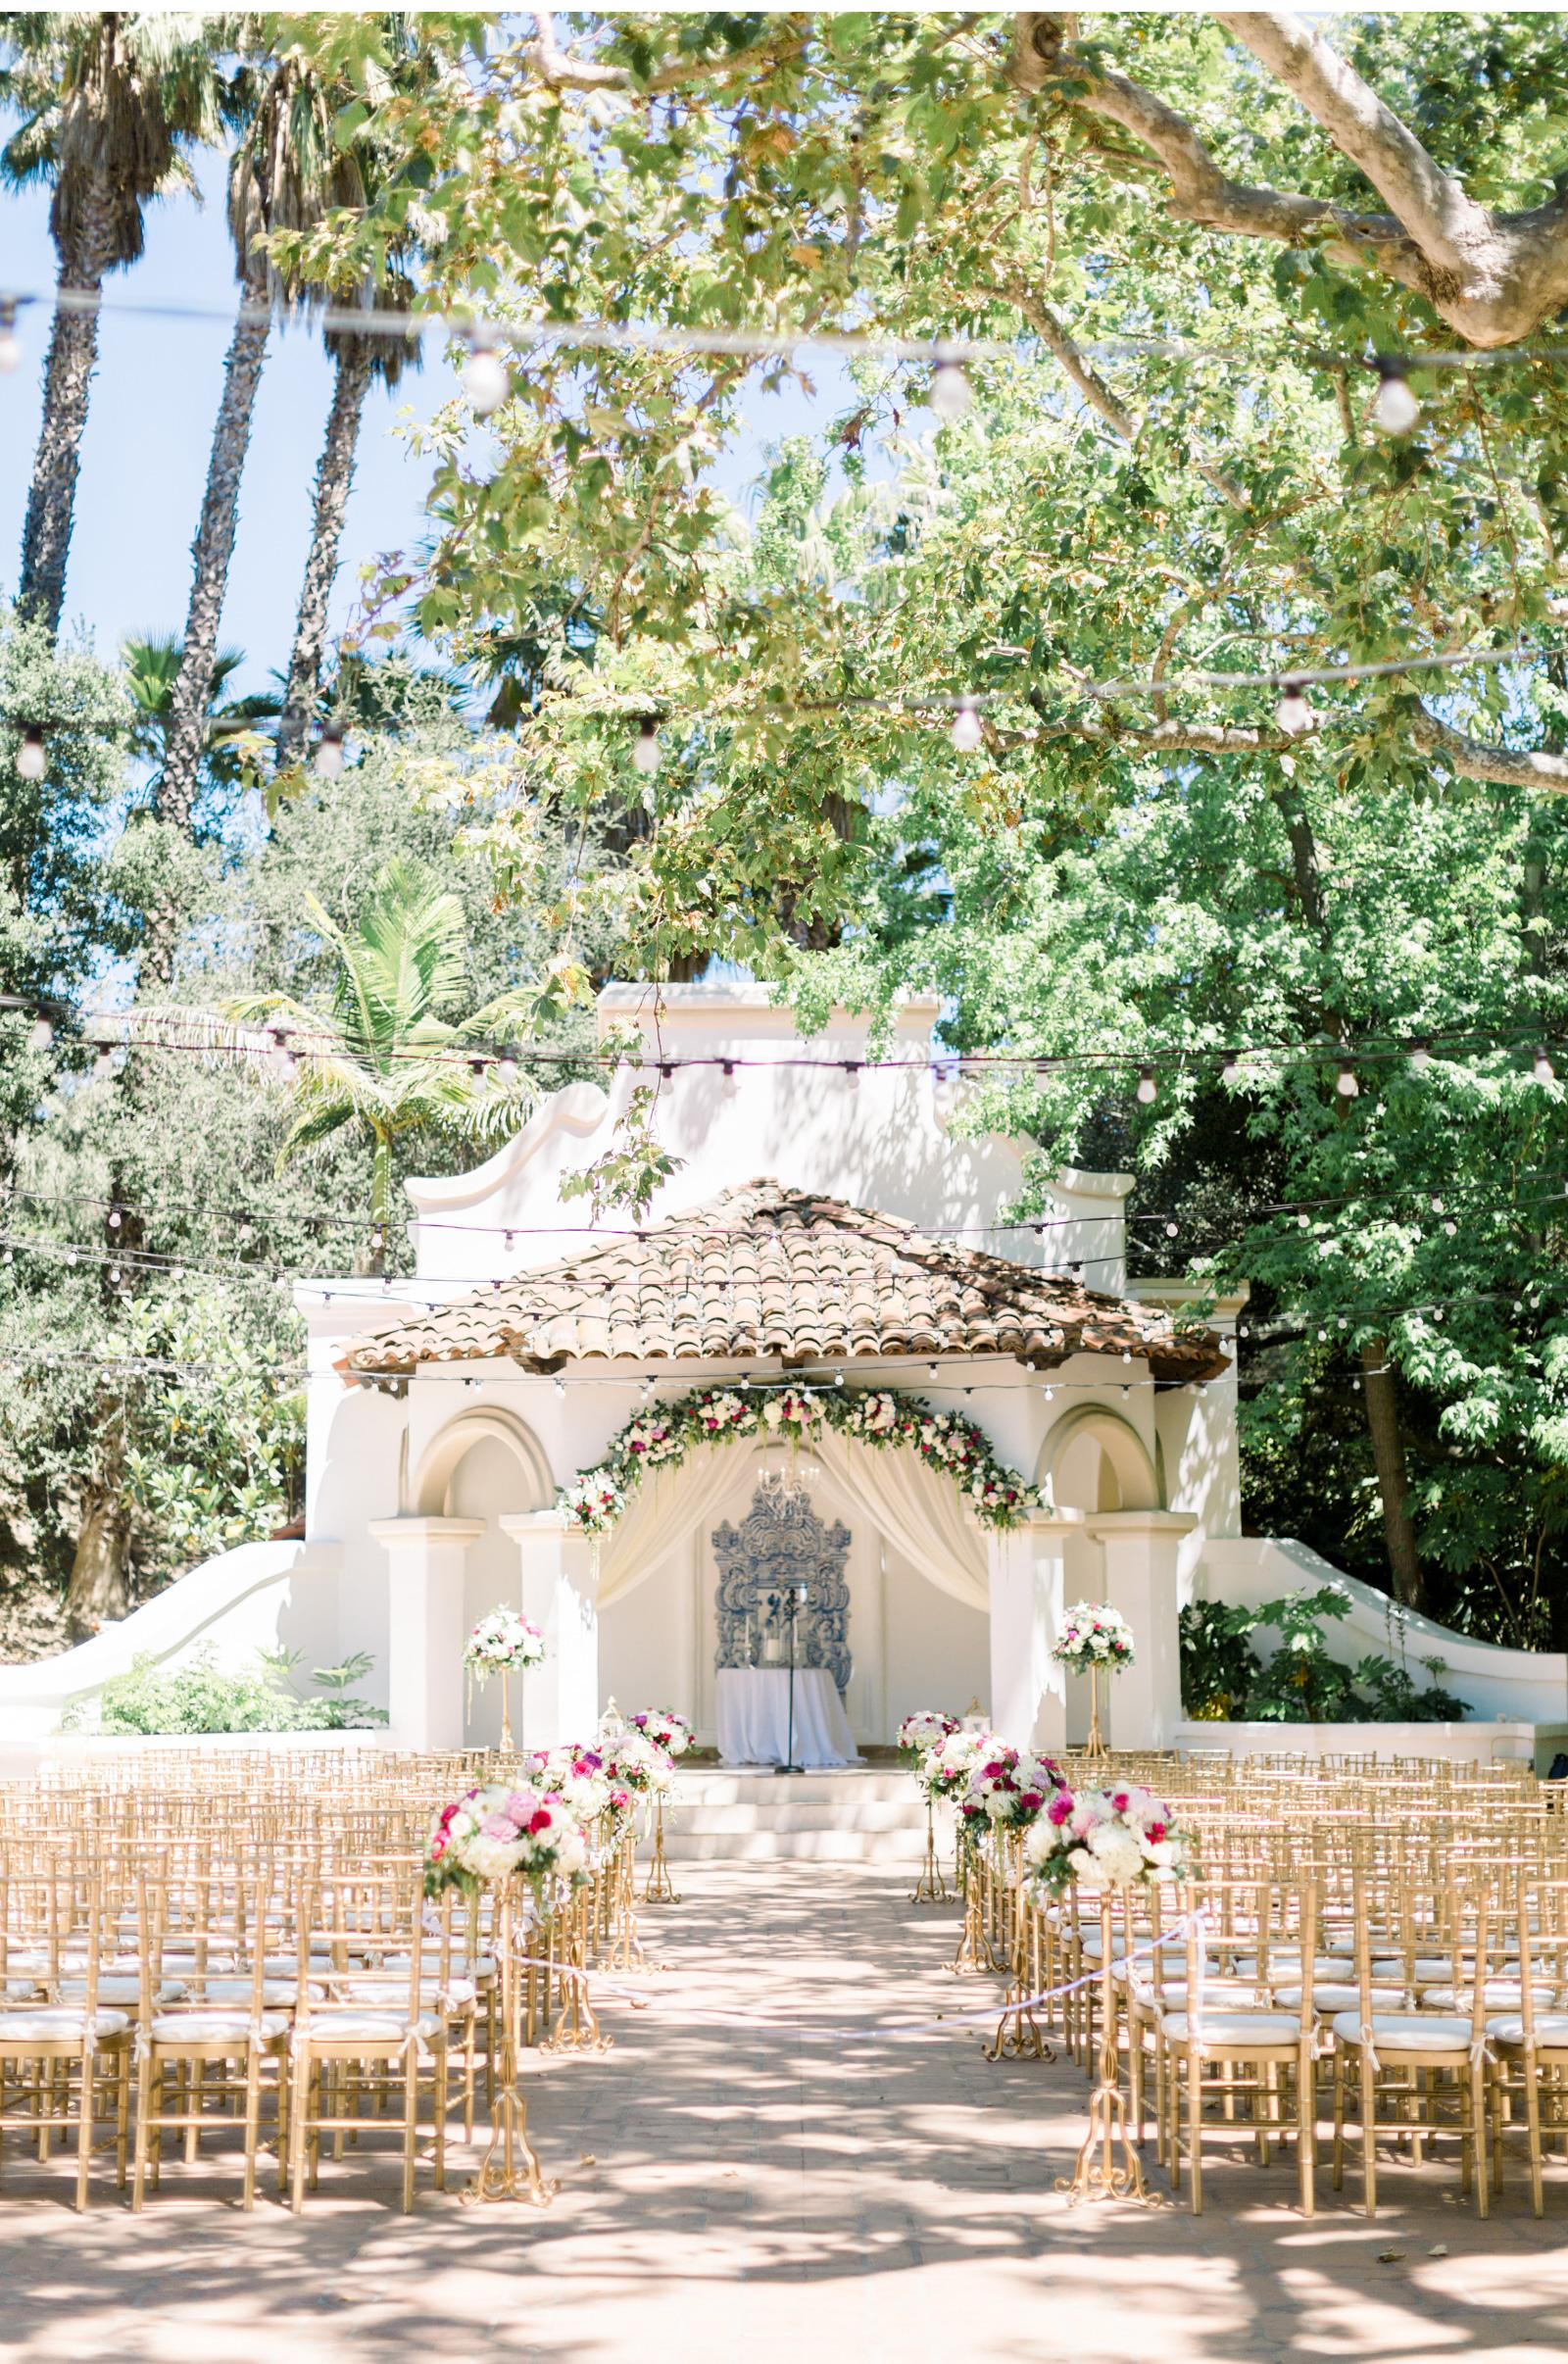 Rancho-Las-Lomas-Wedding-Natalie-Schutt-Photography_01.jpg